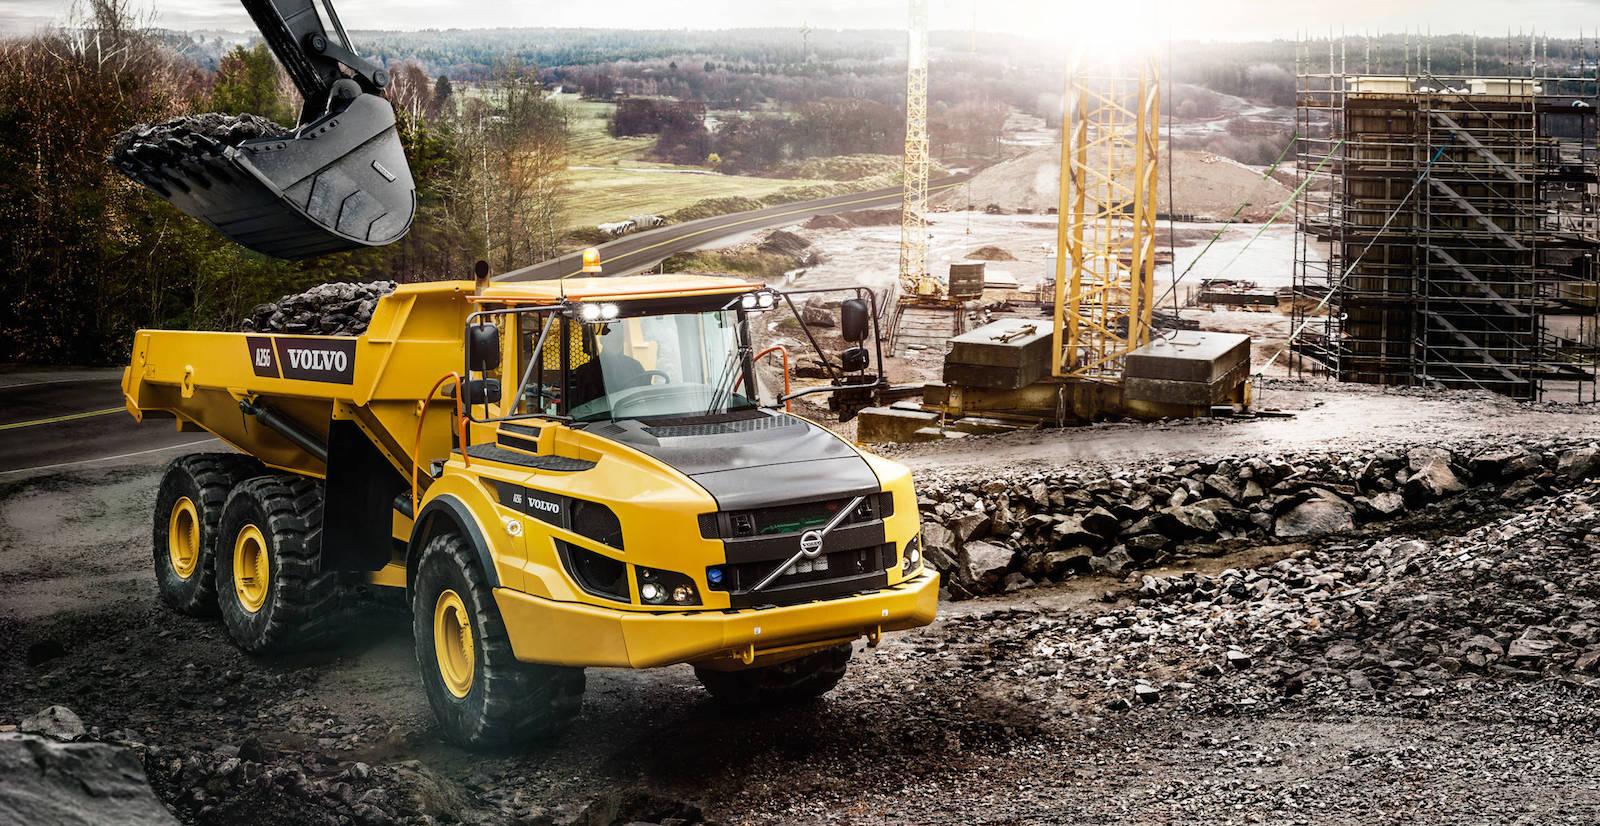 Volvo Dumper a25g